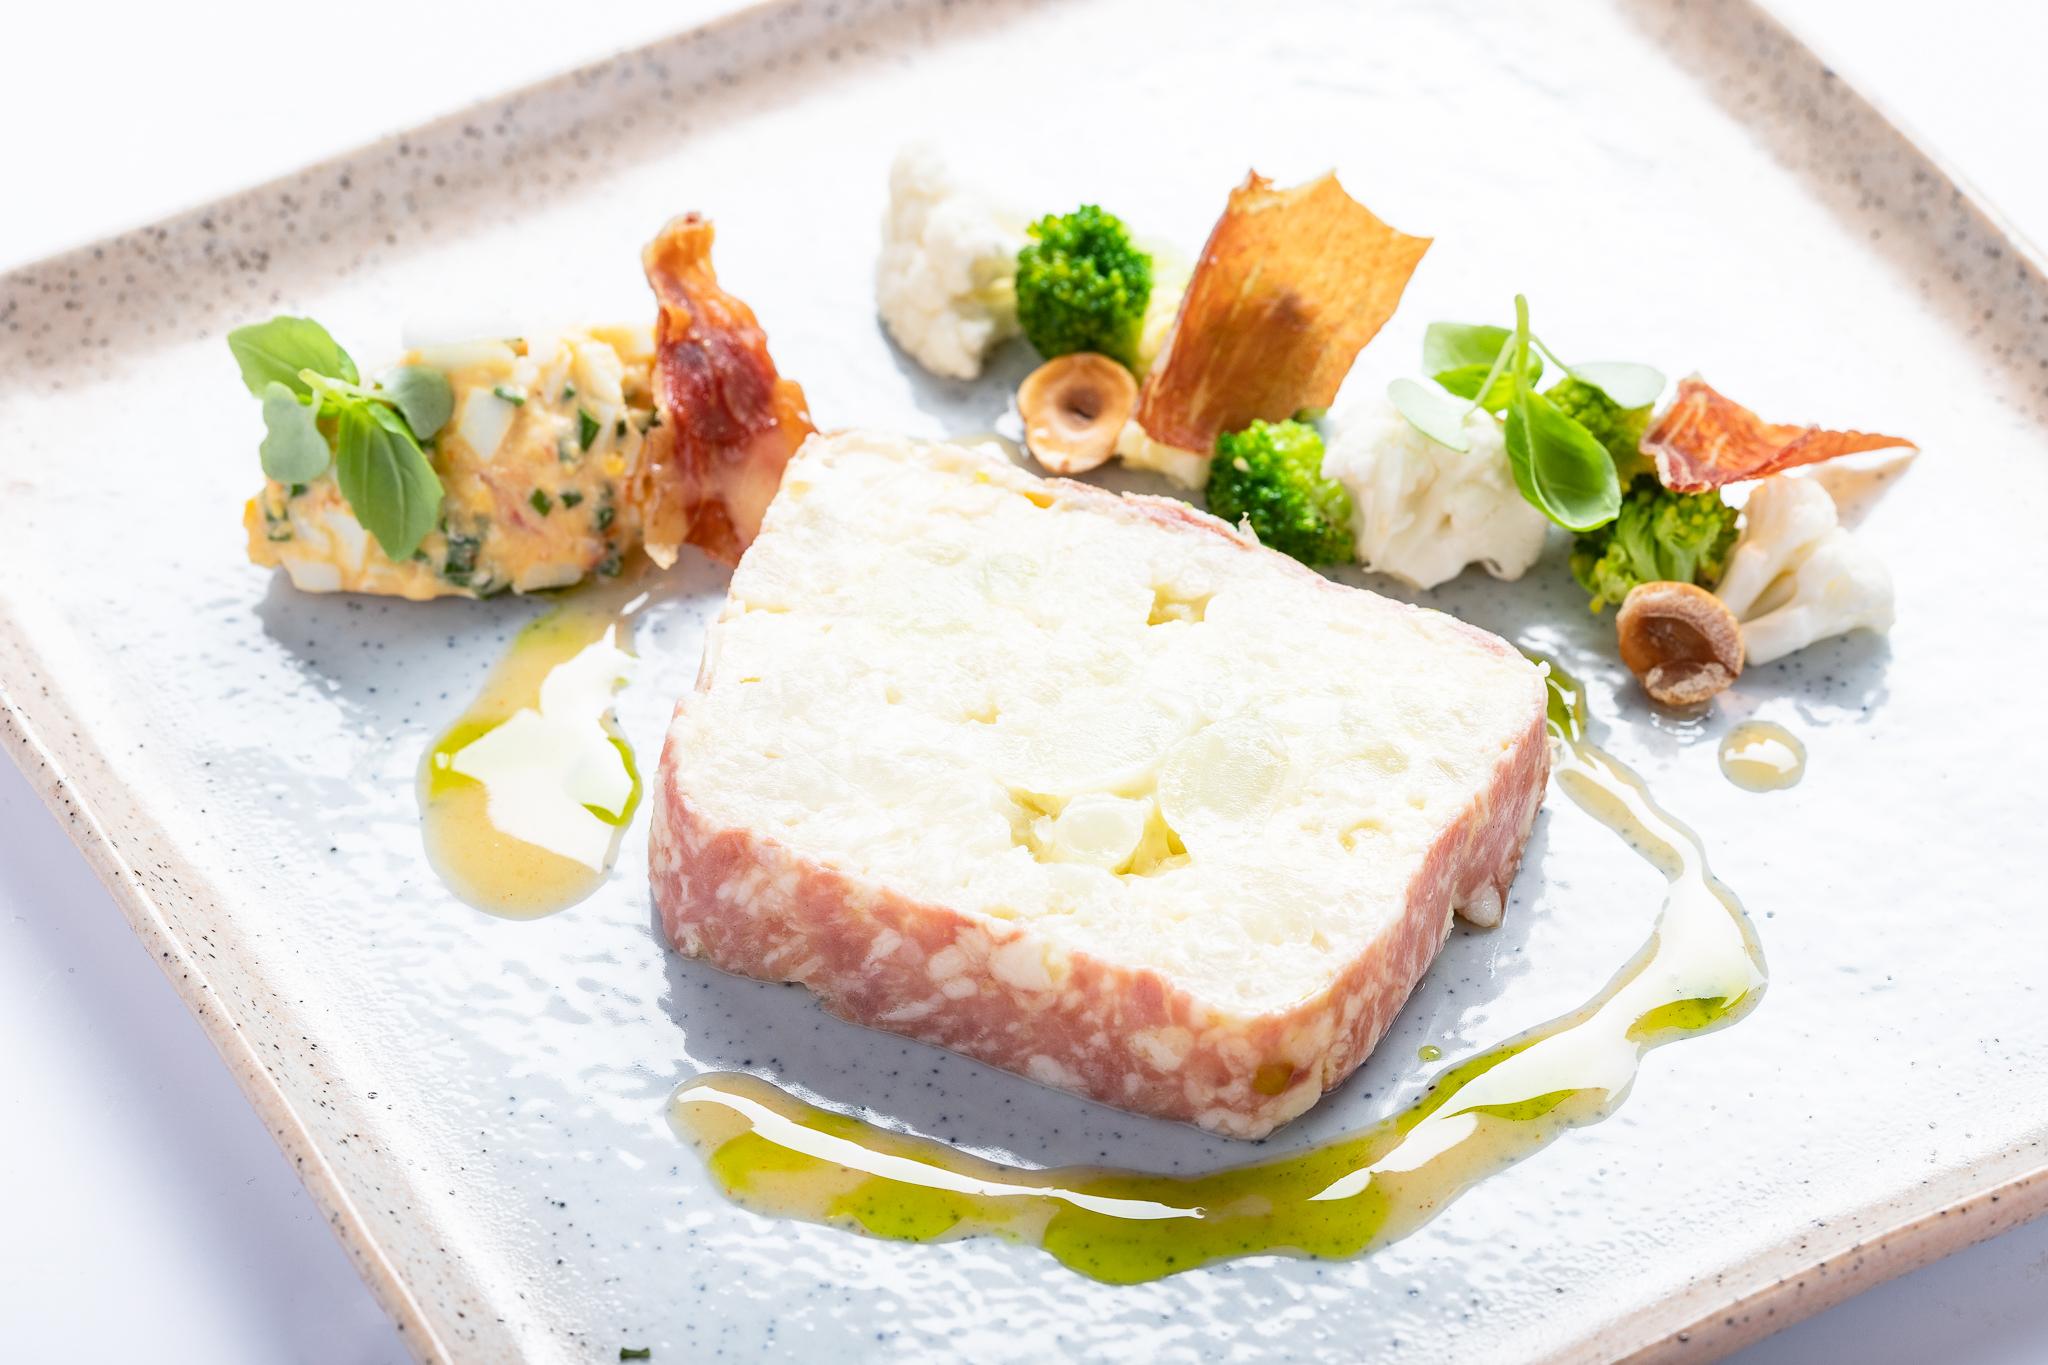 Terrine van bloemkool en hesp, salade van krab - BISTRO REFTER